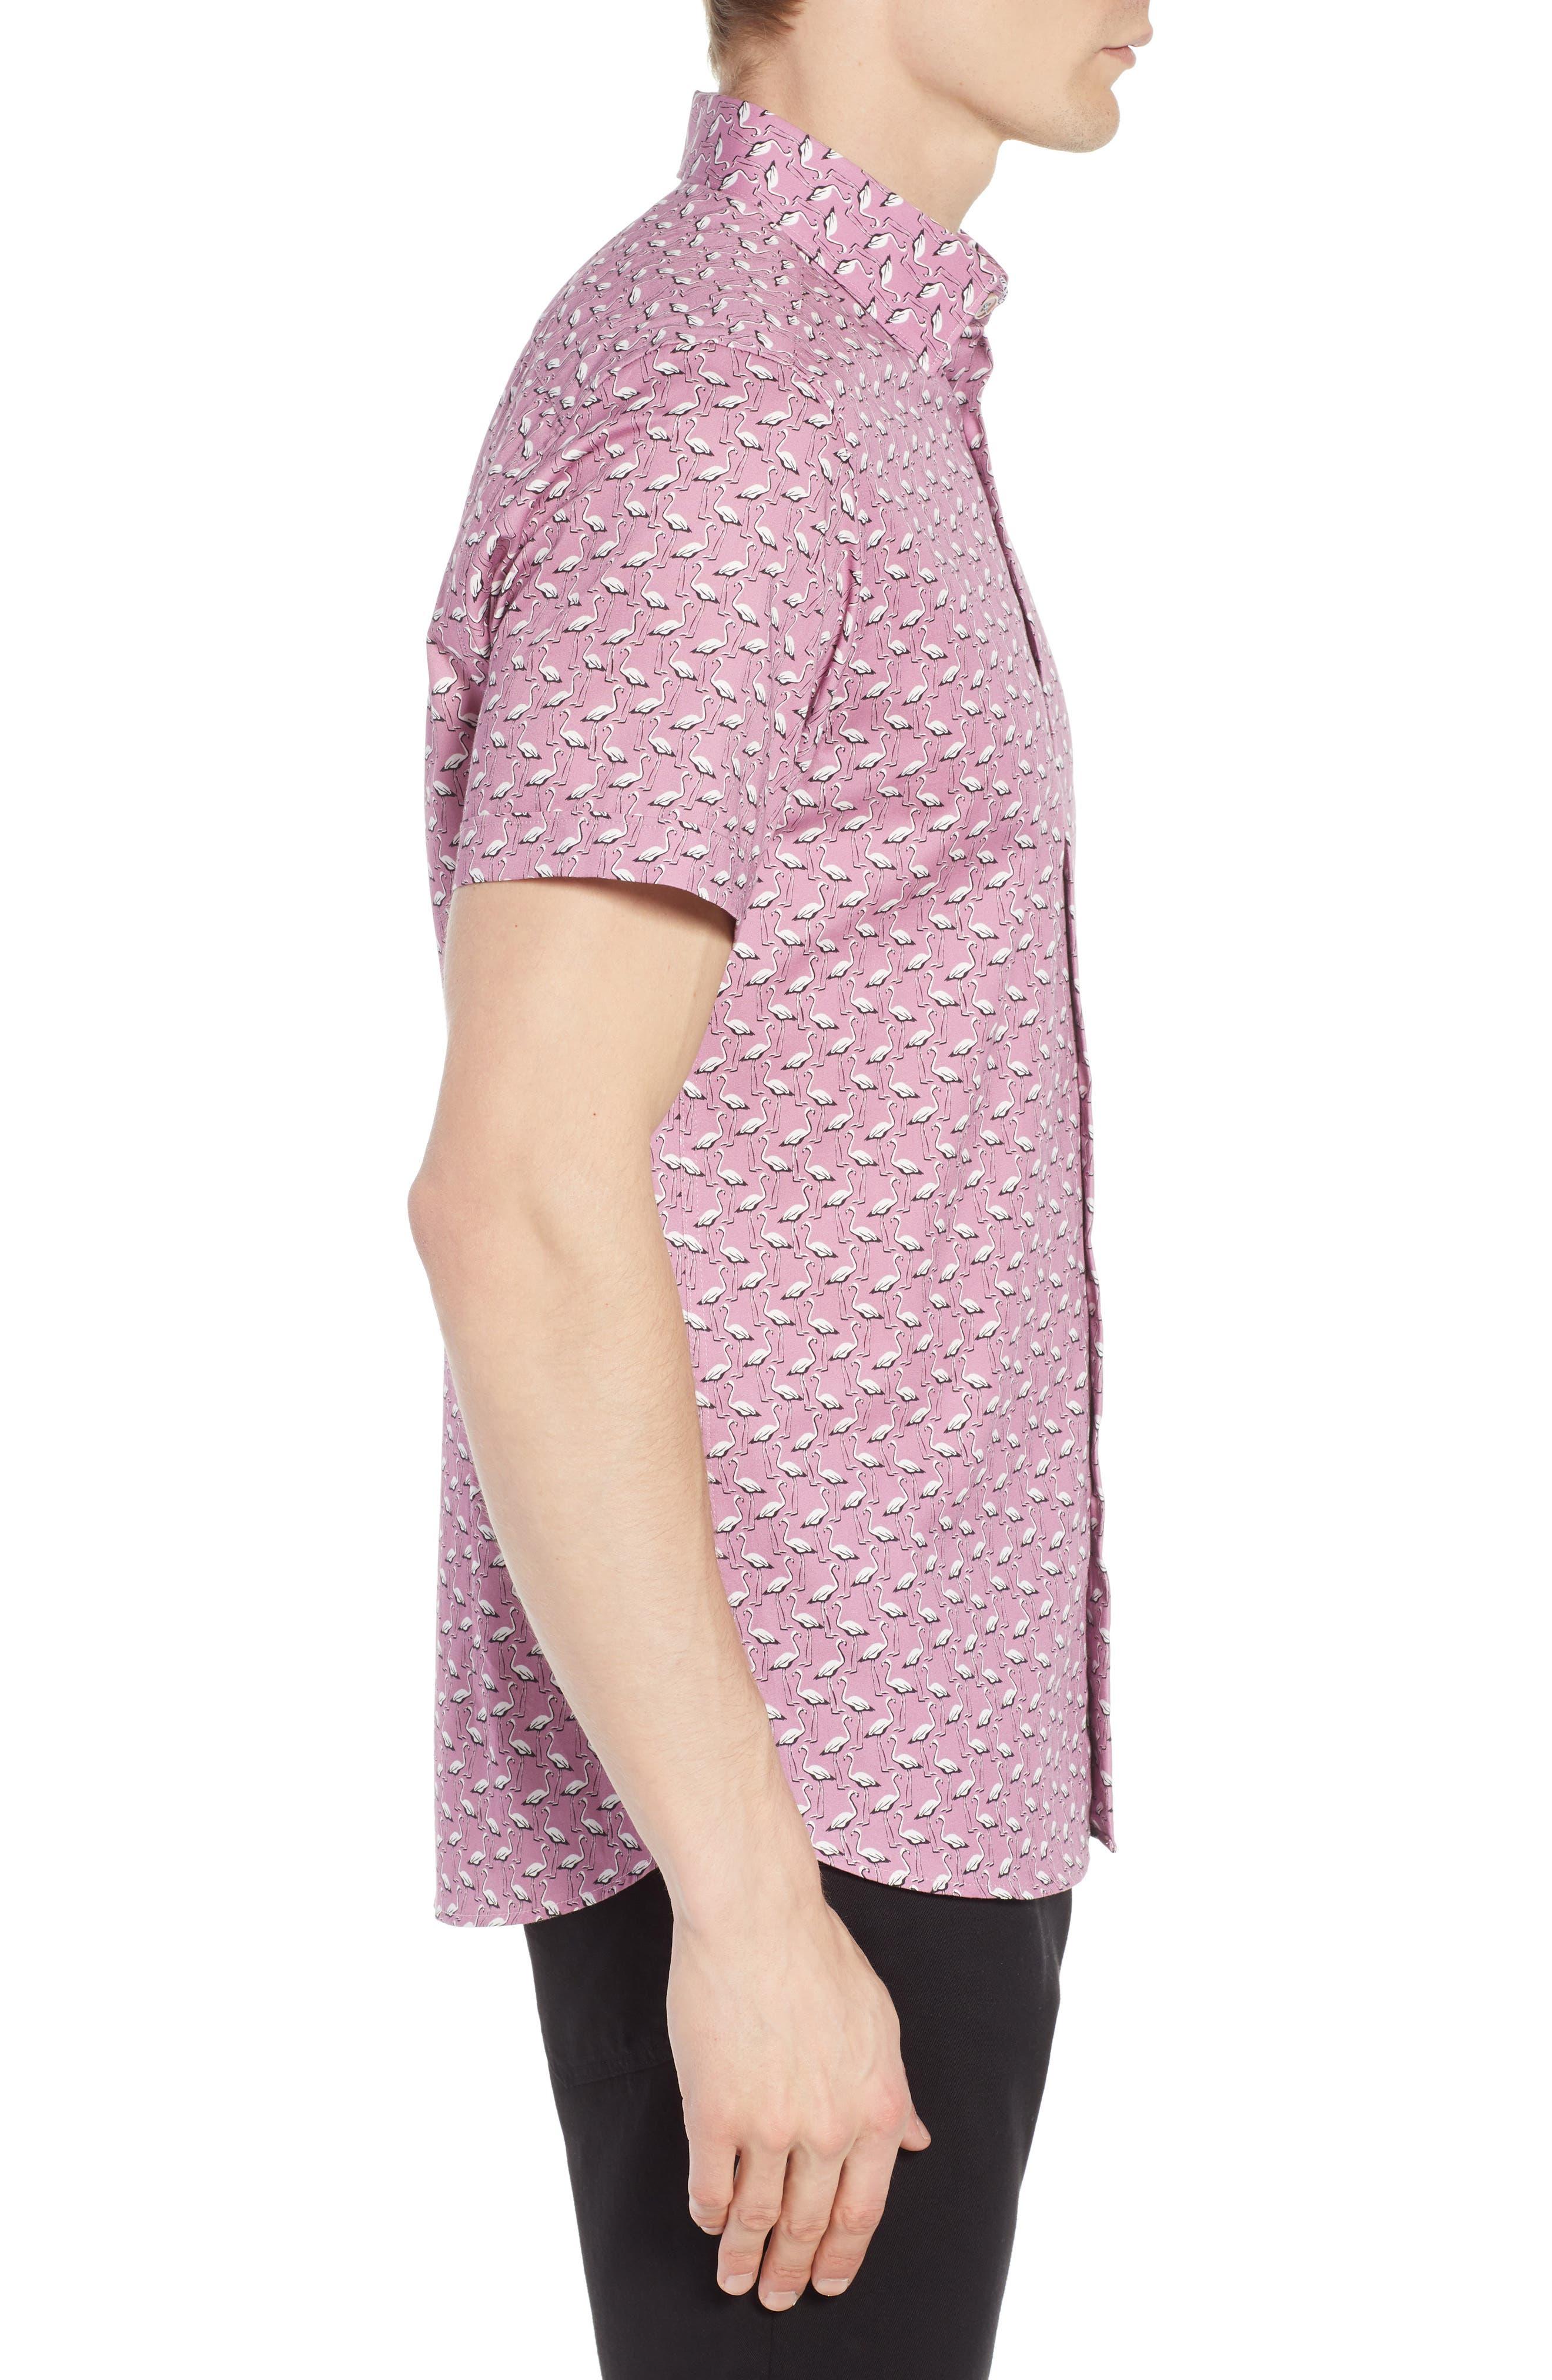 Norflam Flamingo Print Sport Shirt,                             Alternate thumbnail 3, color,                             650